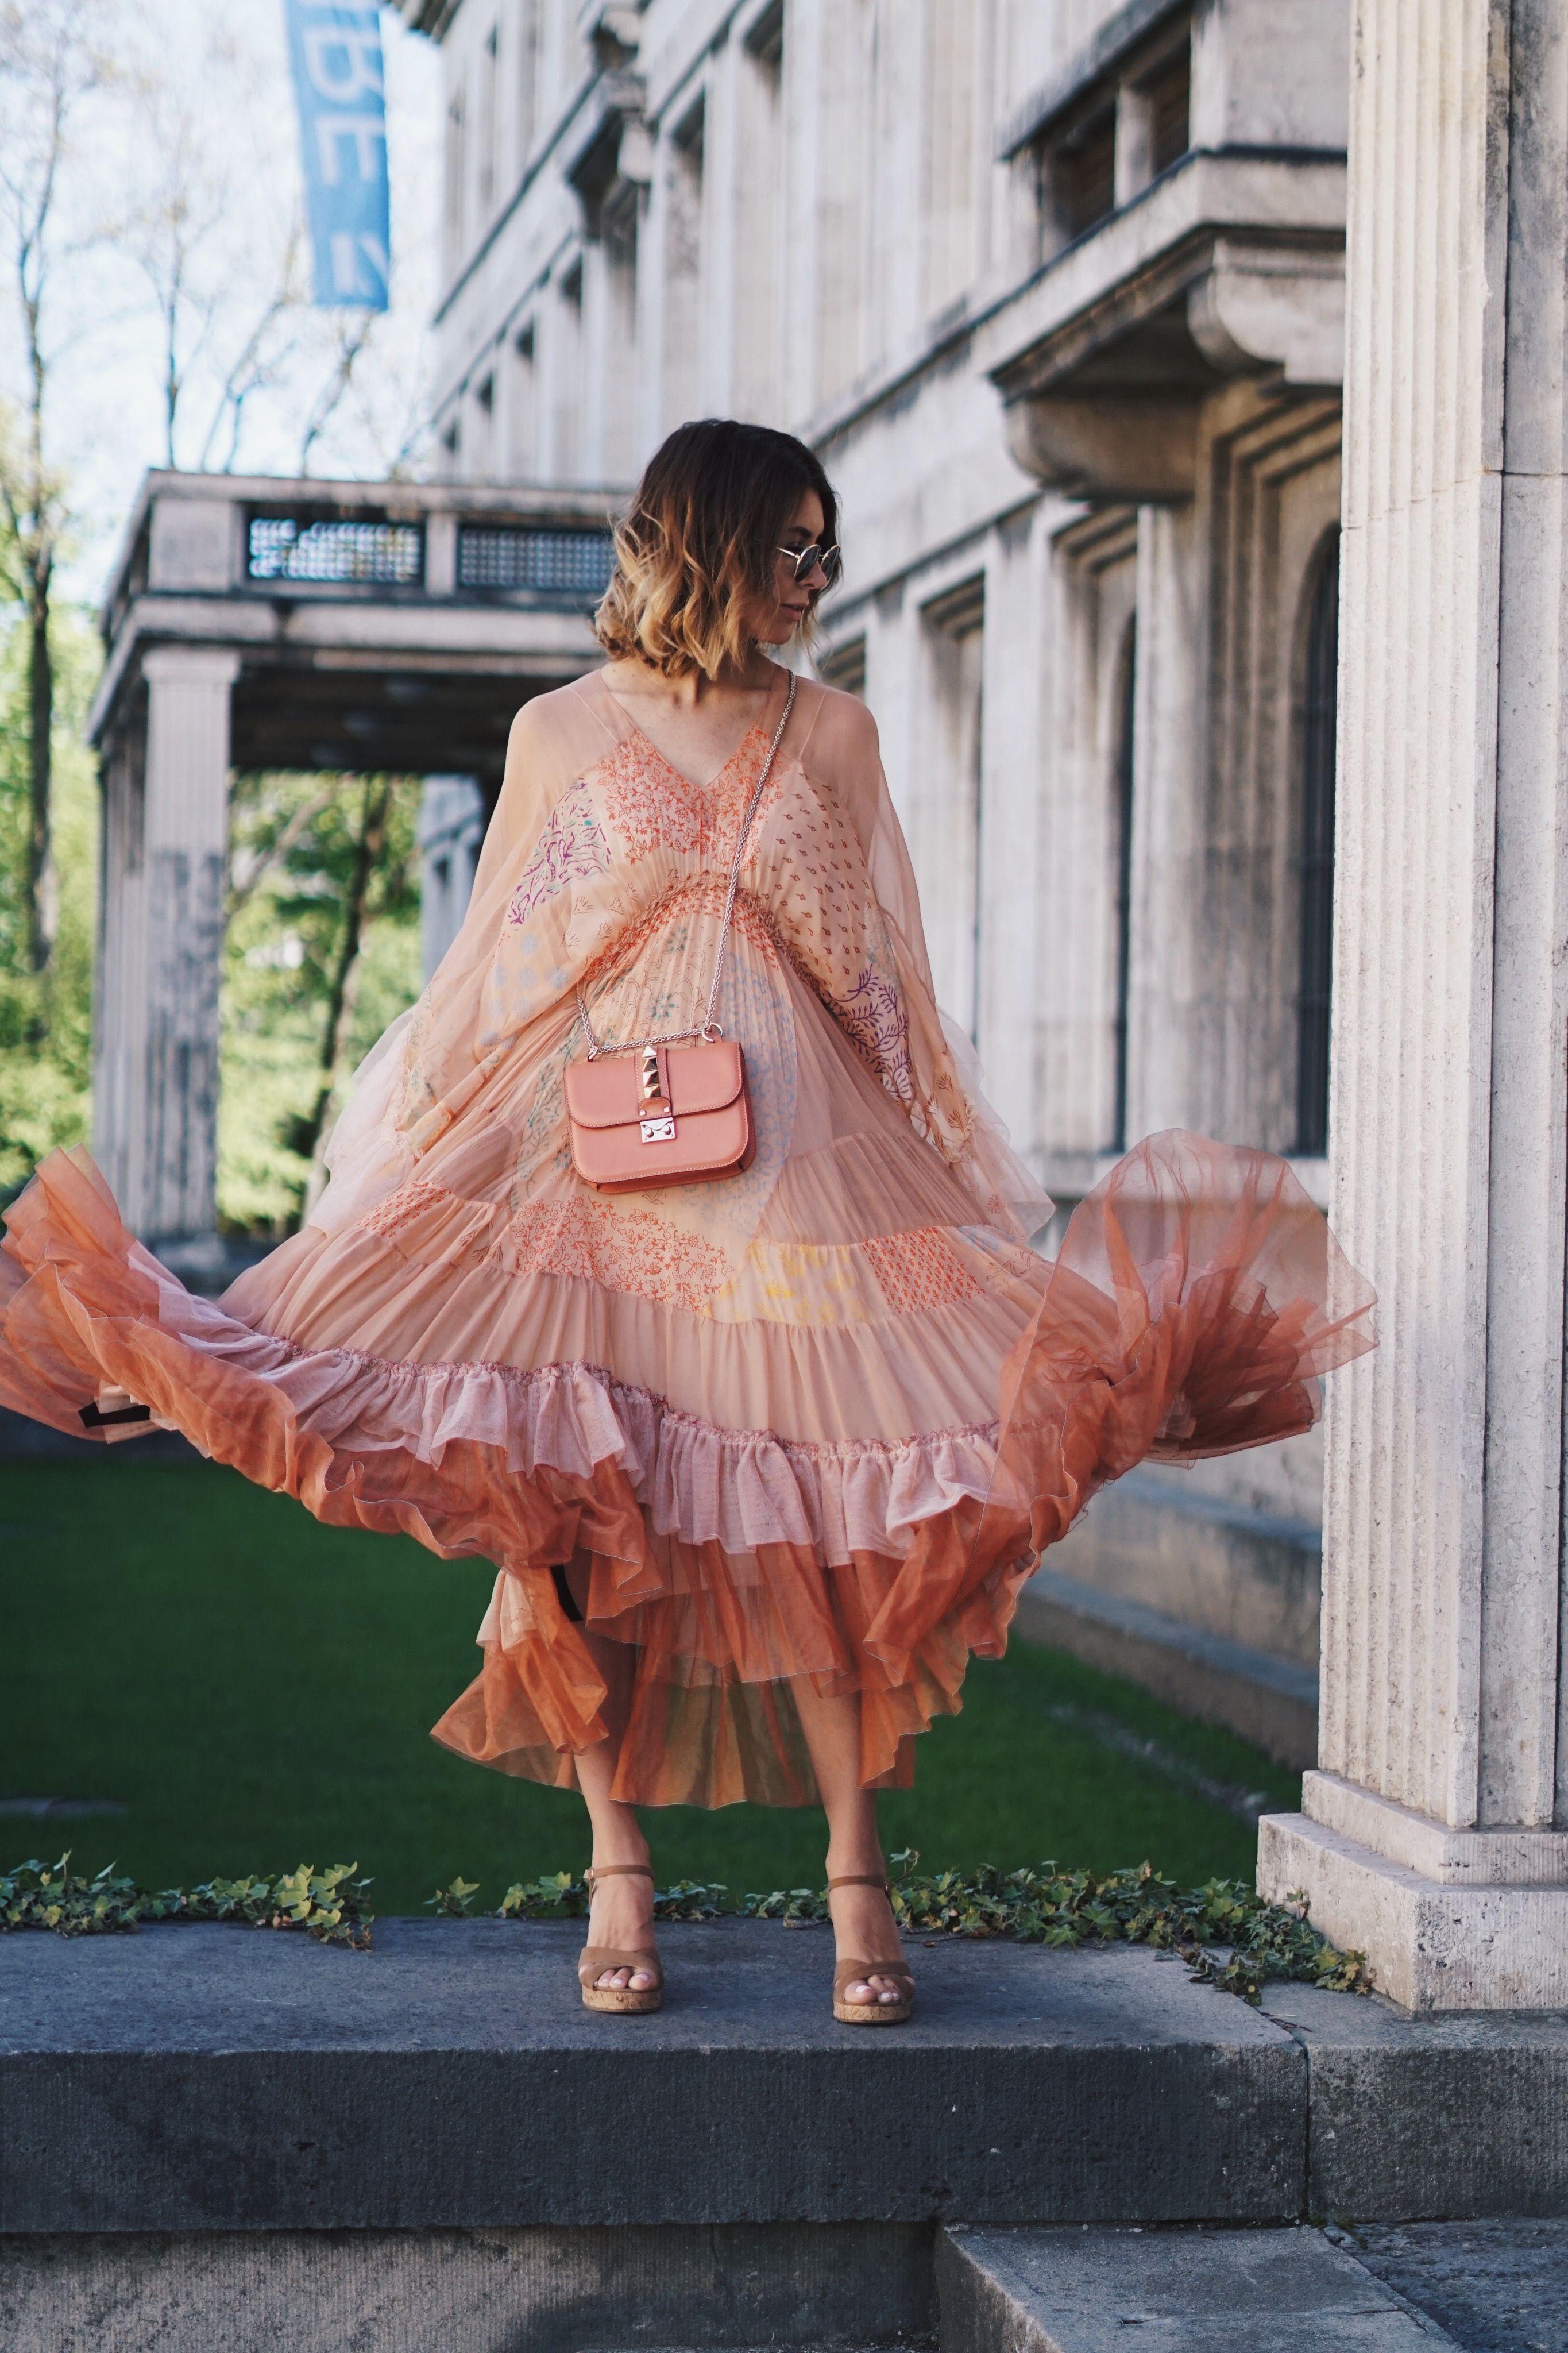 Hippie Mode | das perfekte Outfit im Boho Chic